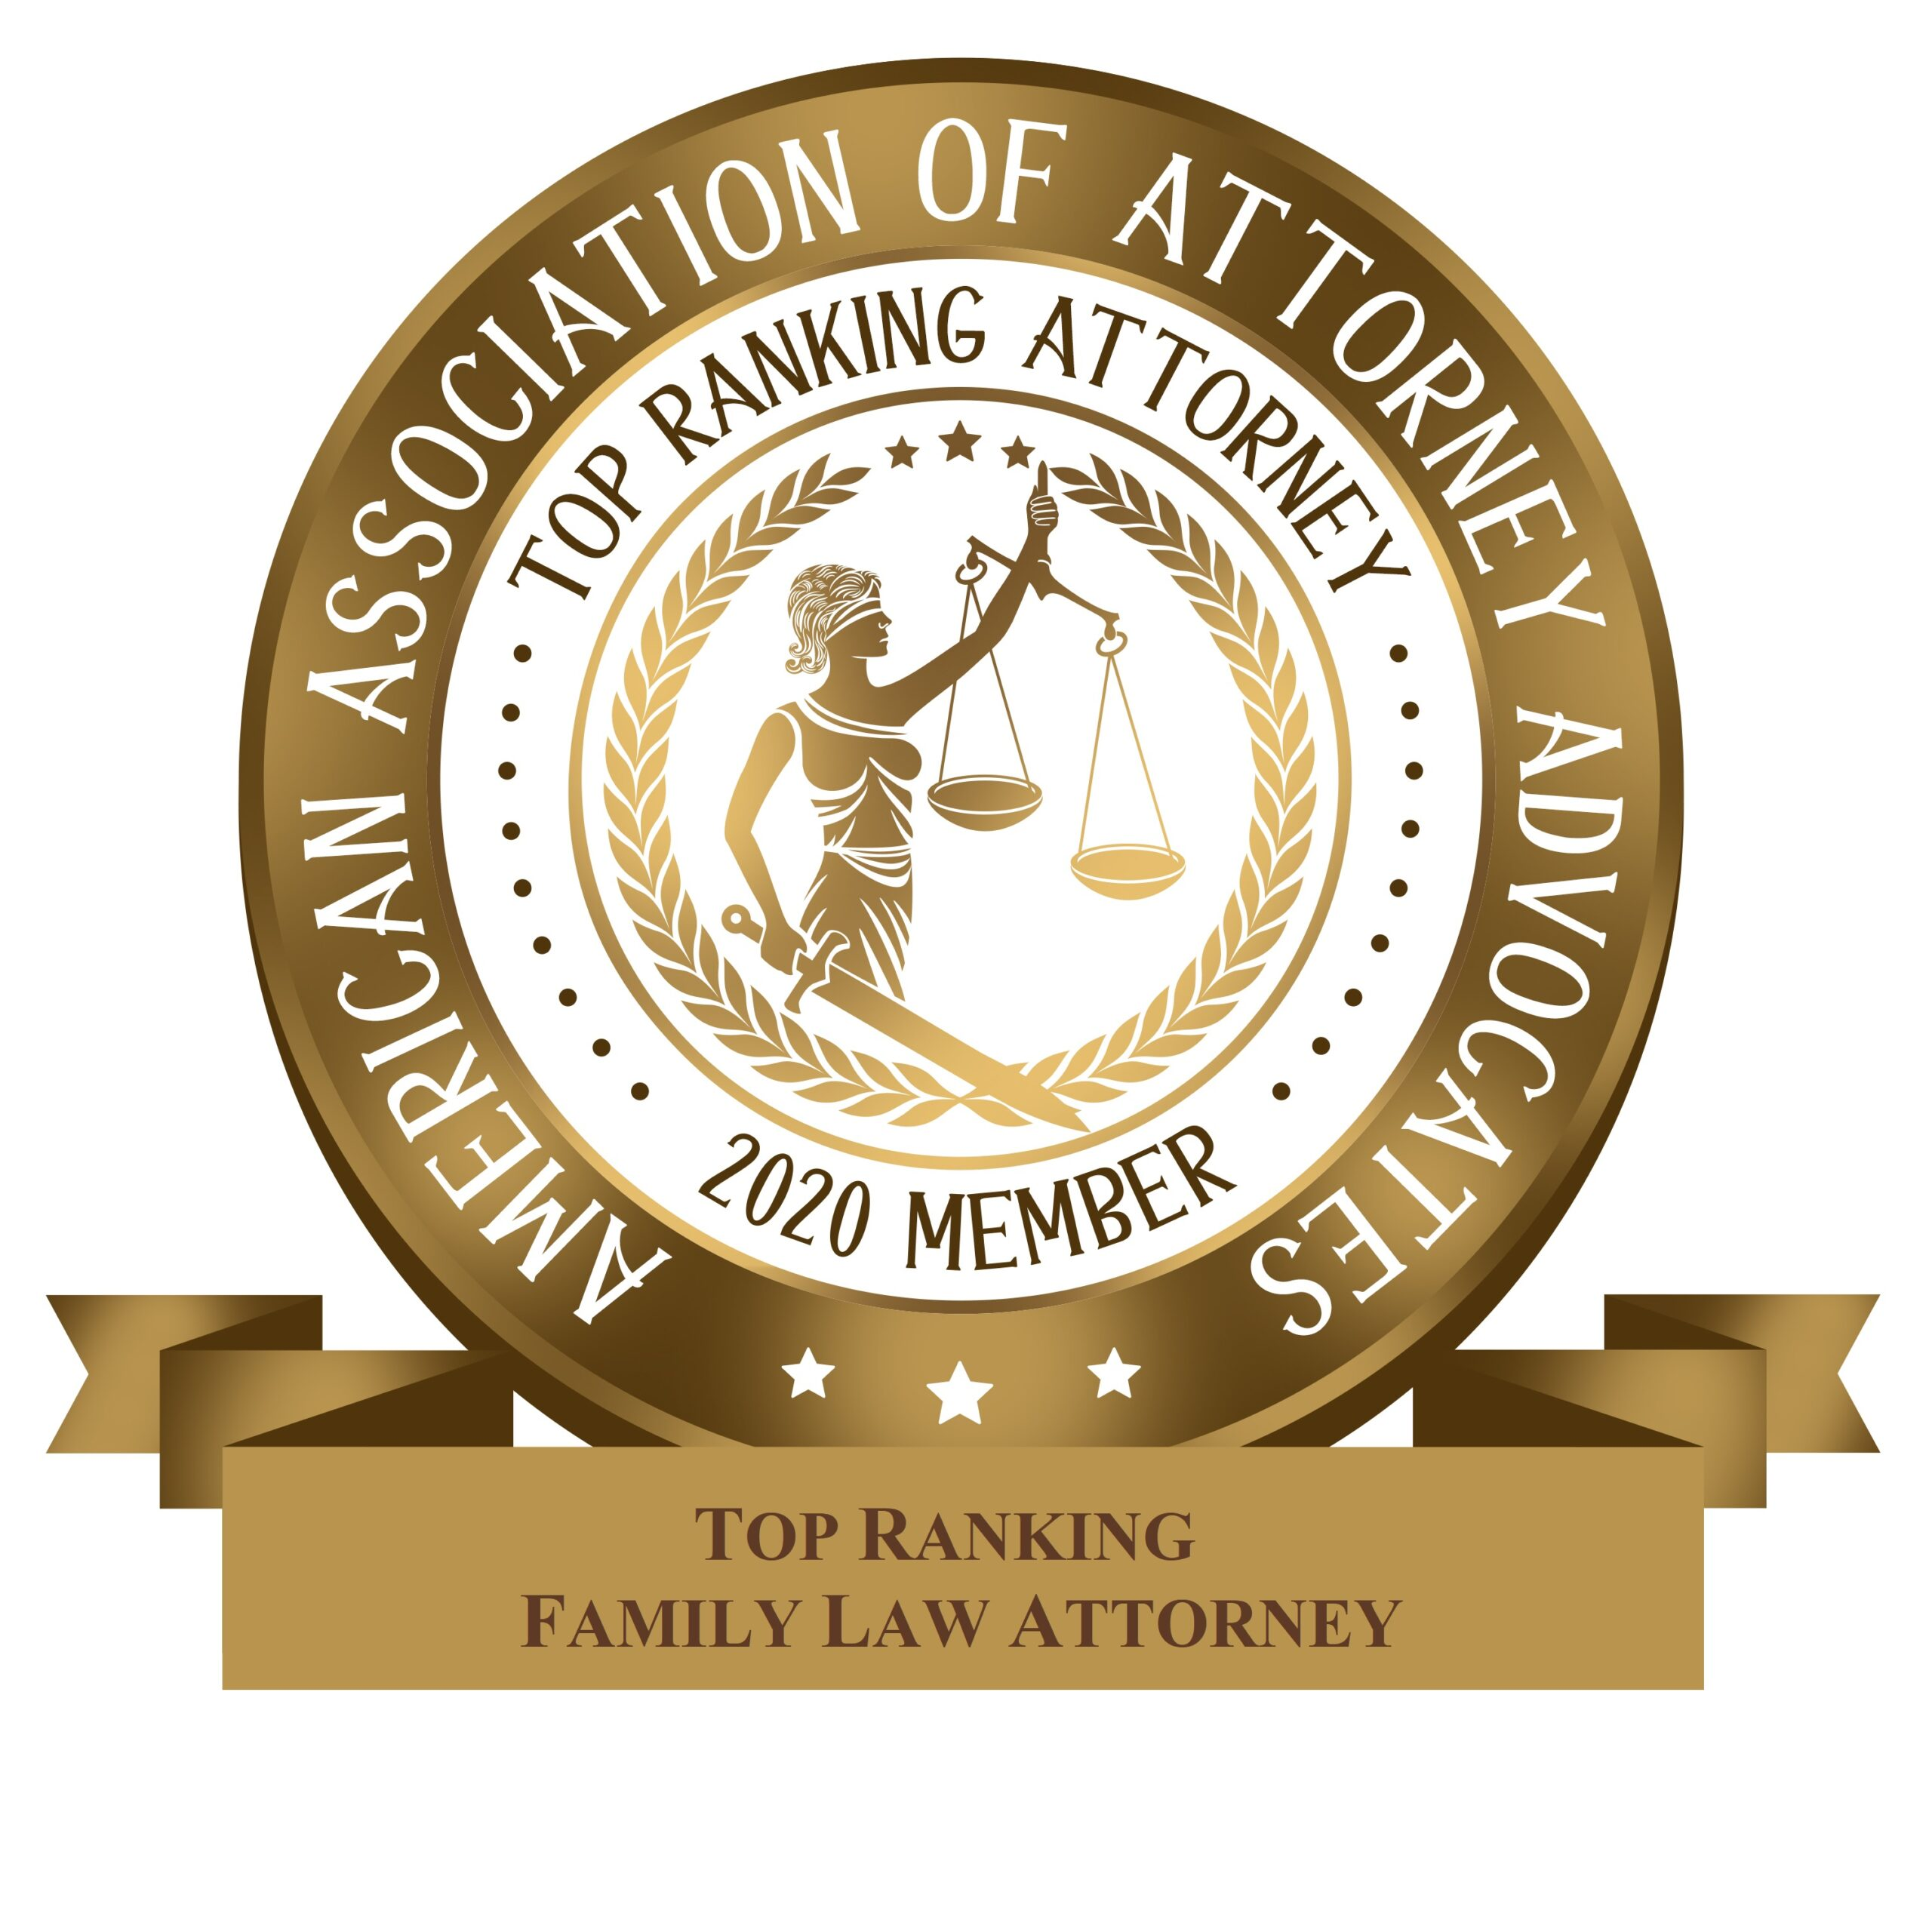 Amercian Association of Attorney Advocates (2020)